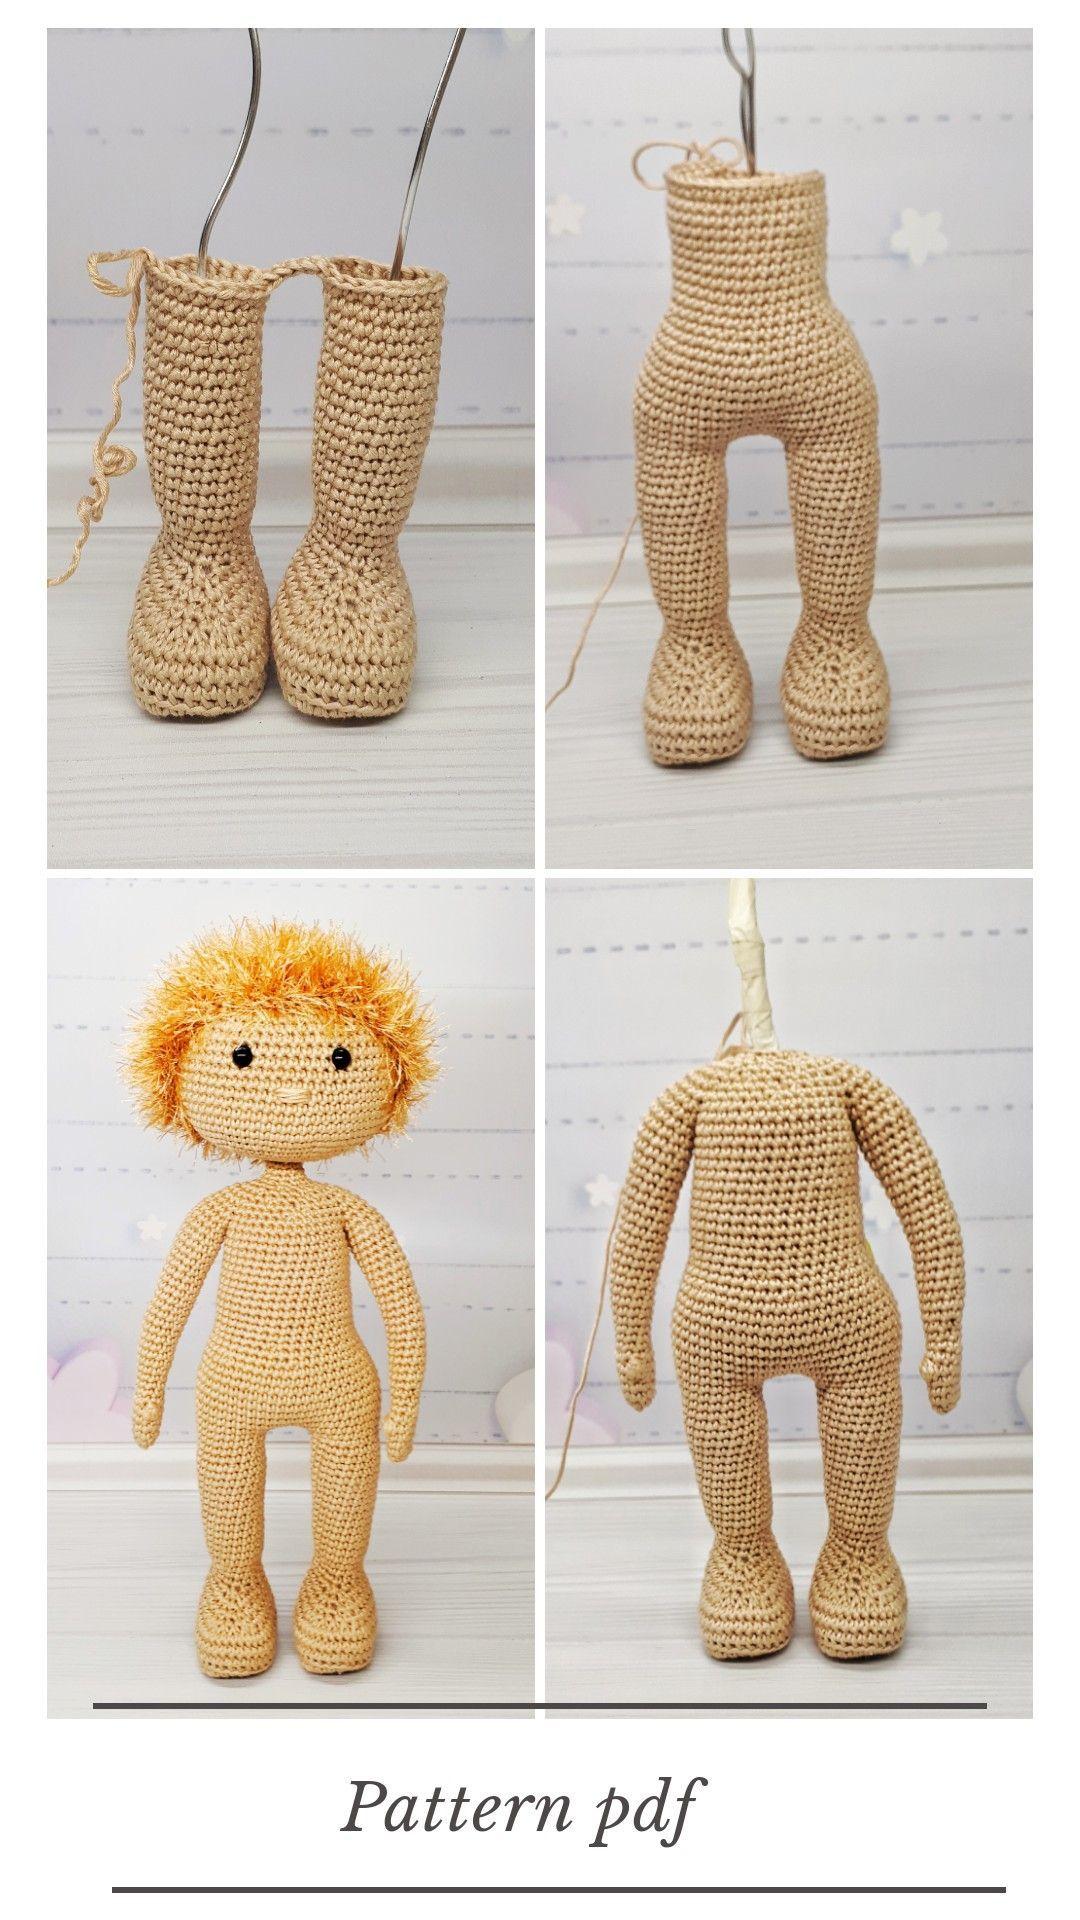 Bonnie Clown Doll - Amigurumi DIY Crochet Kit » Available 5 Languages   1920x1080